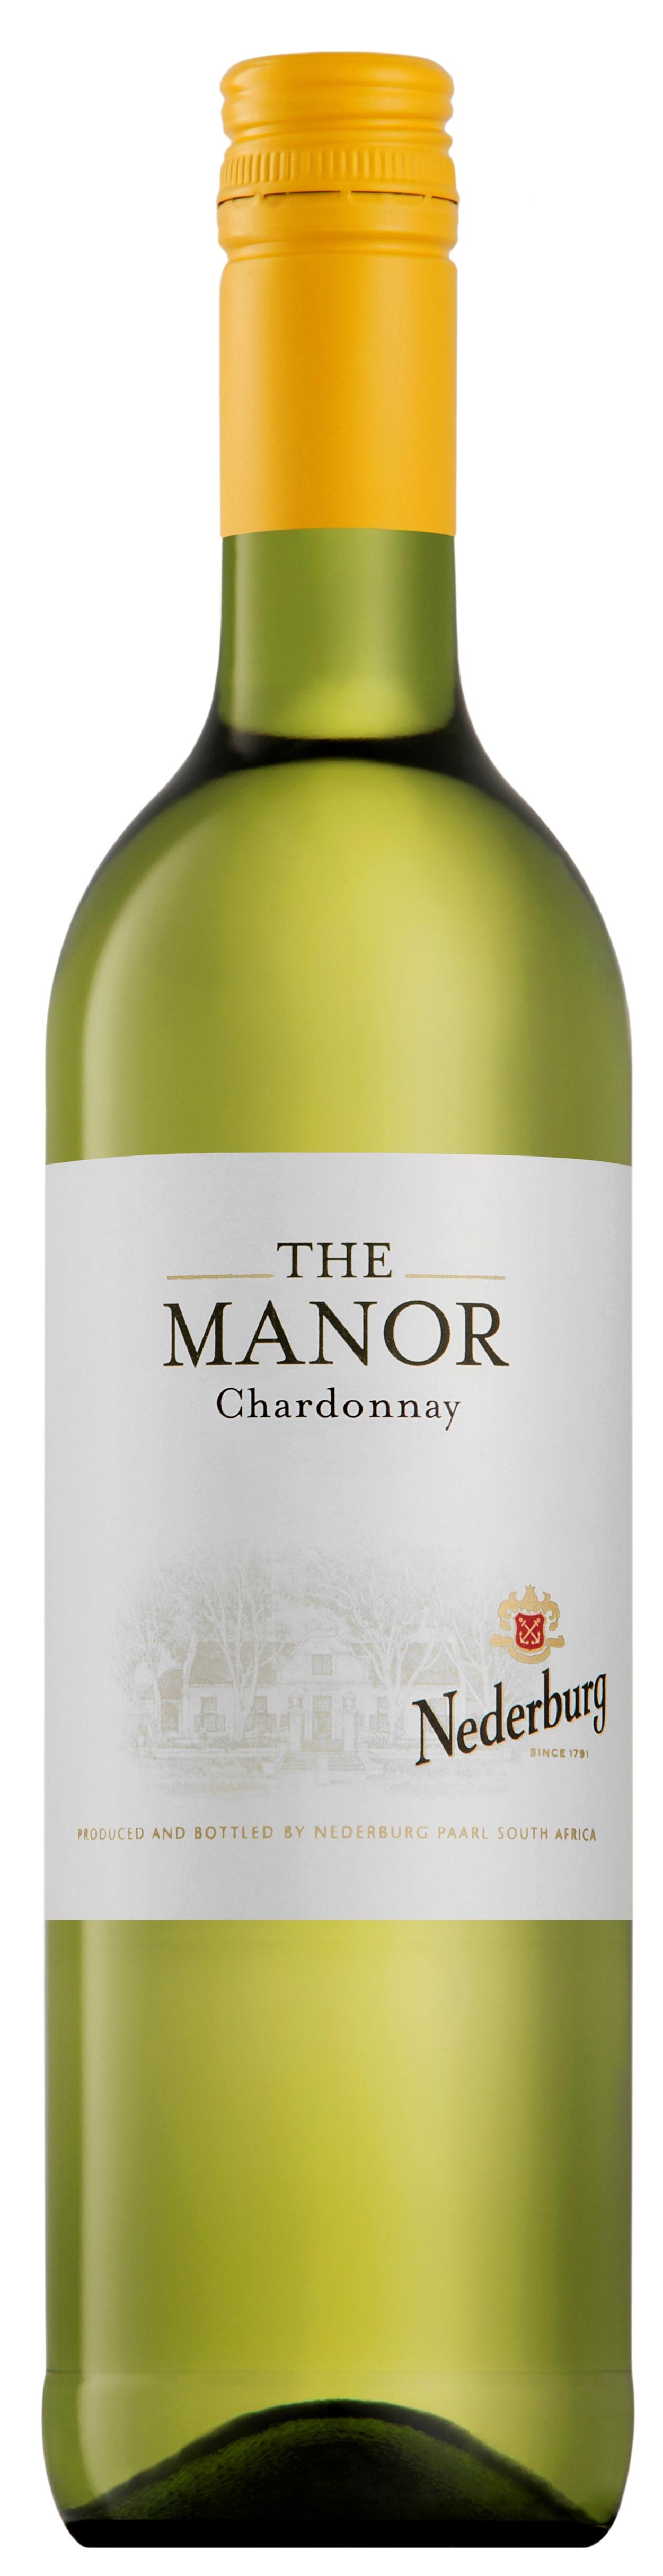 Nederburg The Manor Chardonnay